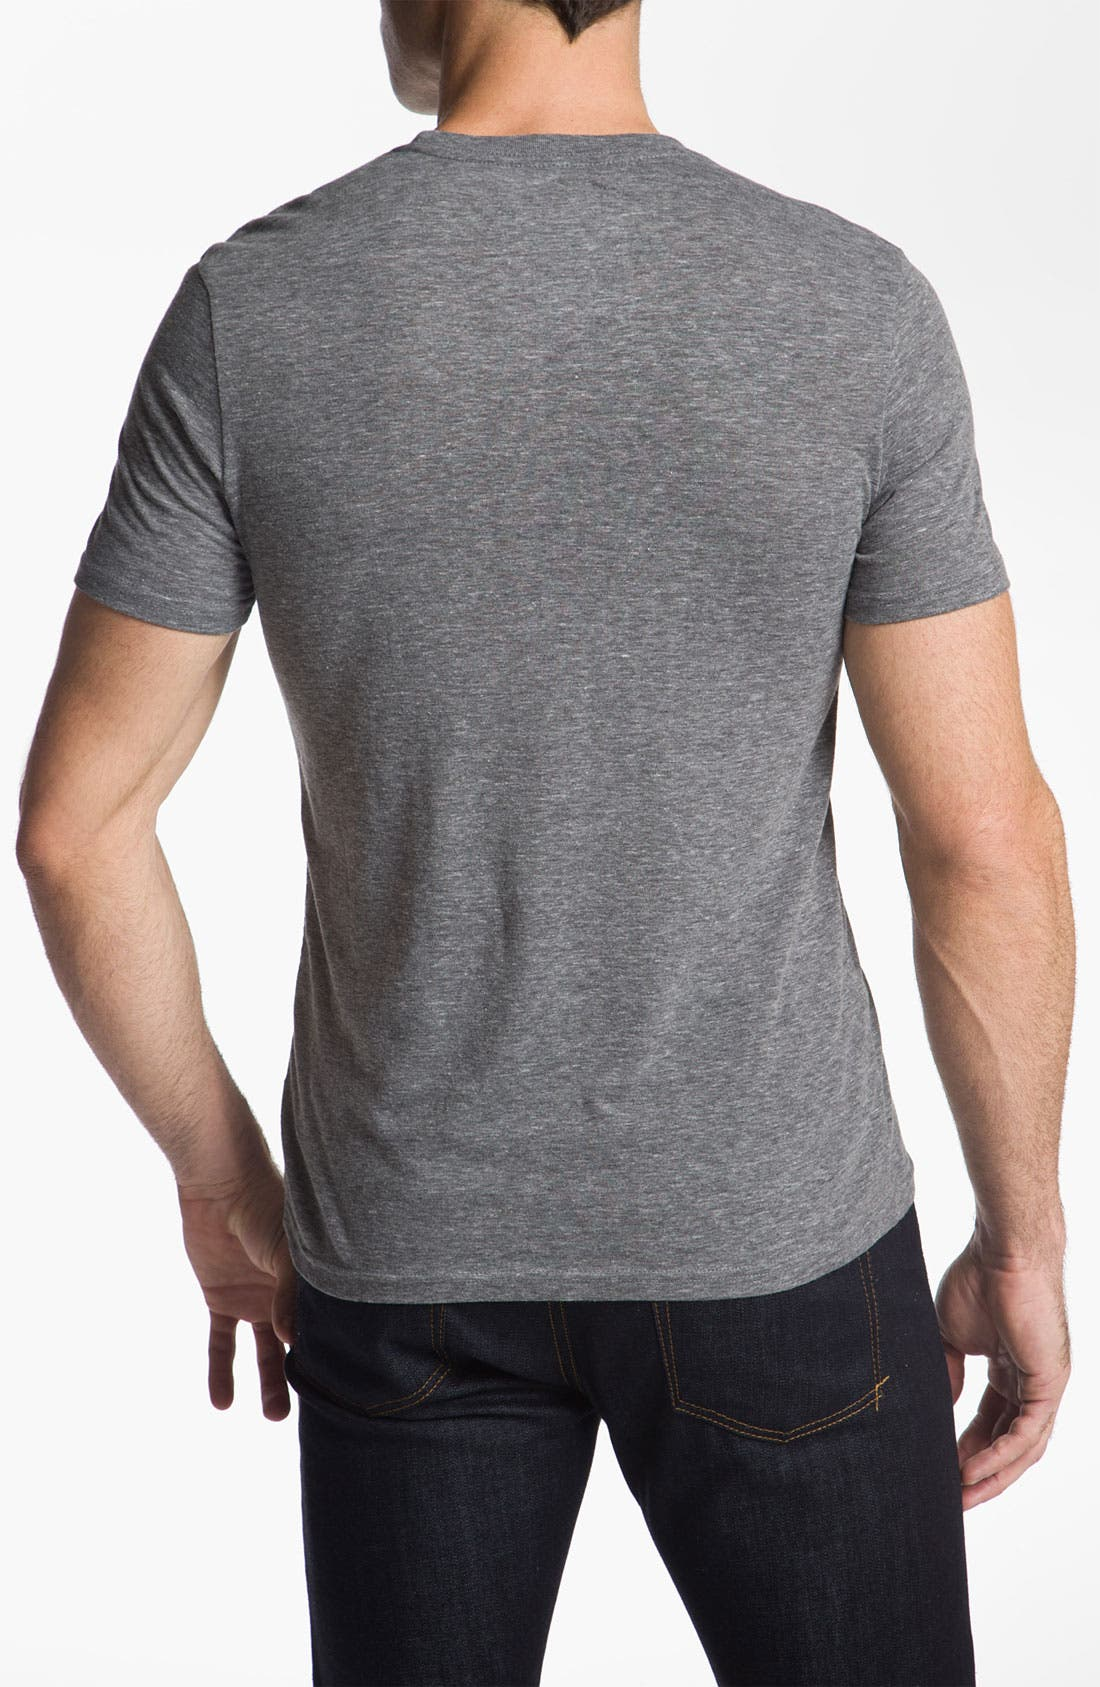 Alternate Image 2  - Hurley 'Shock Treatment' Graphic T-Shirt